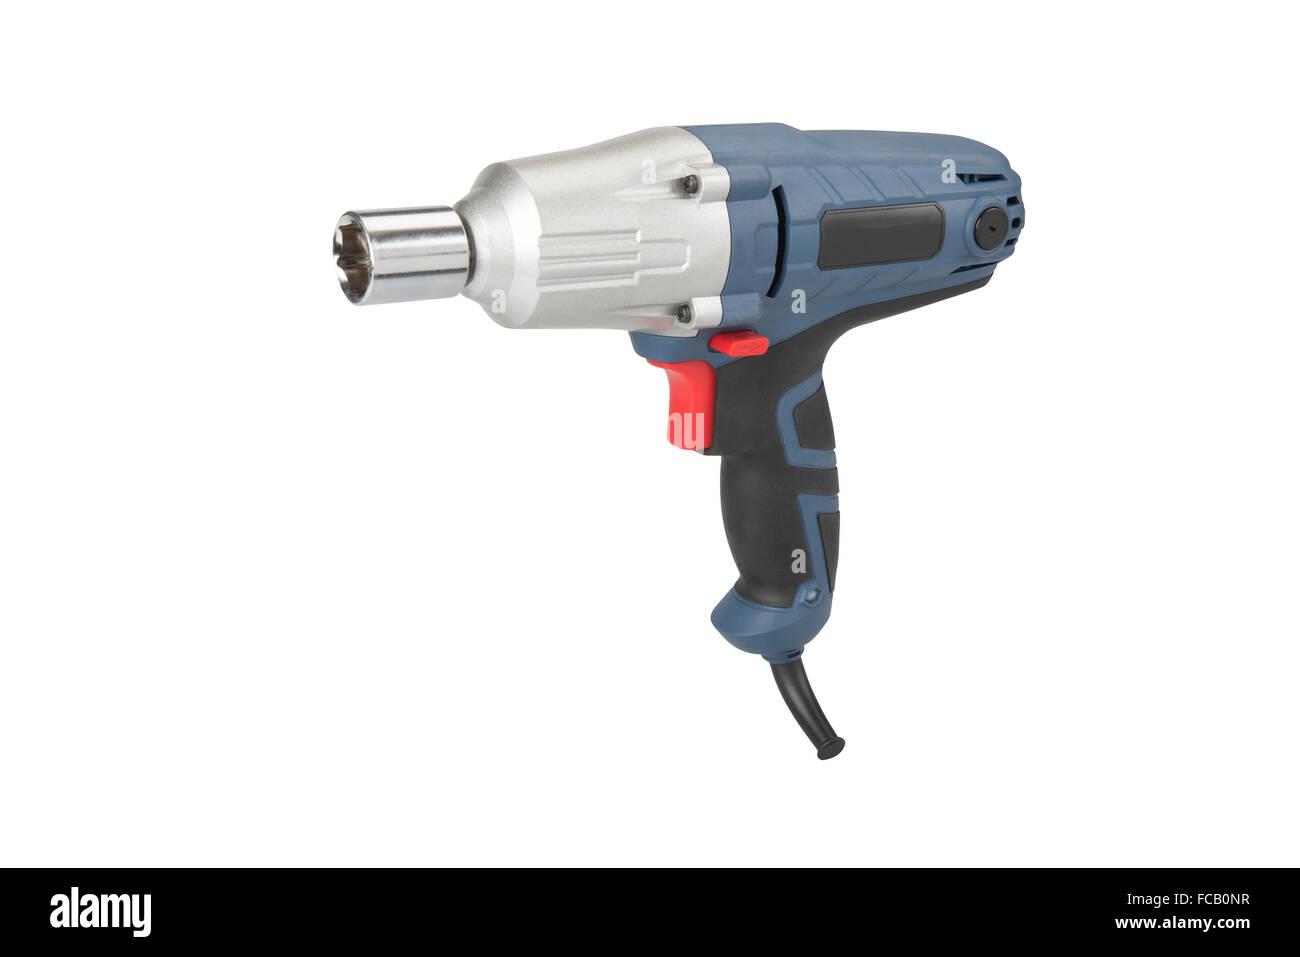 Impact wrench - Stock Image